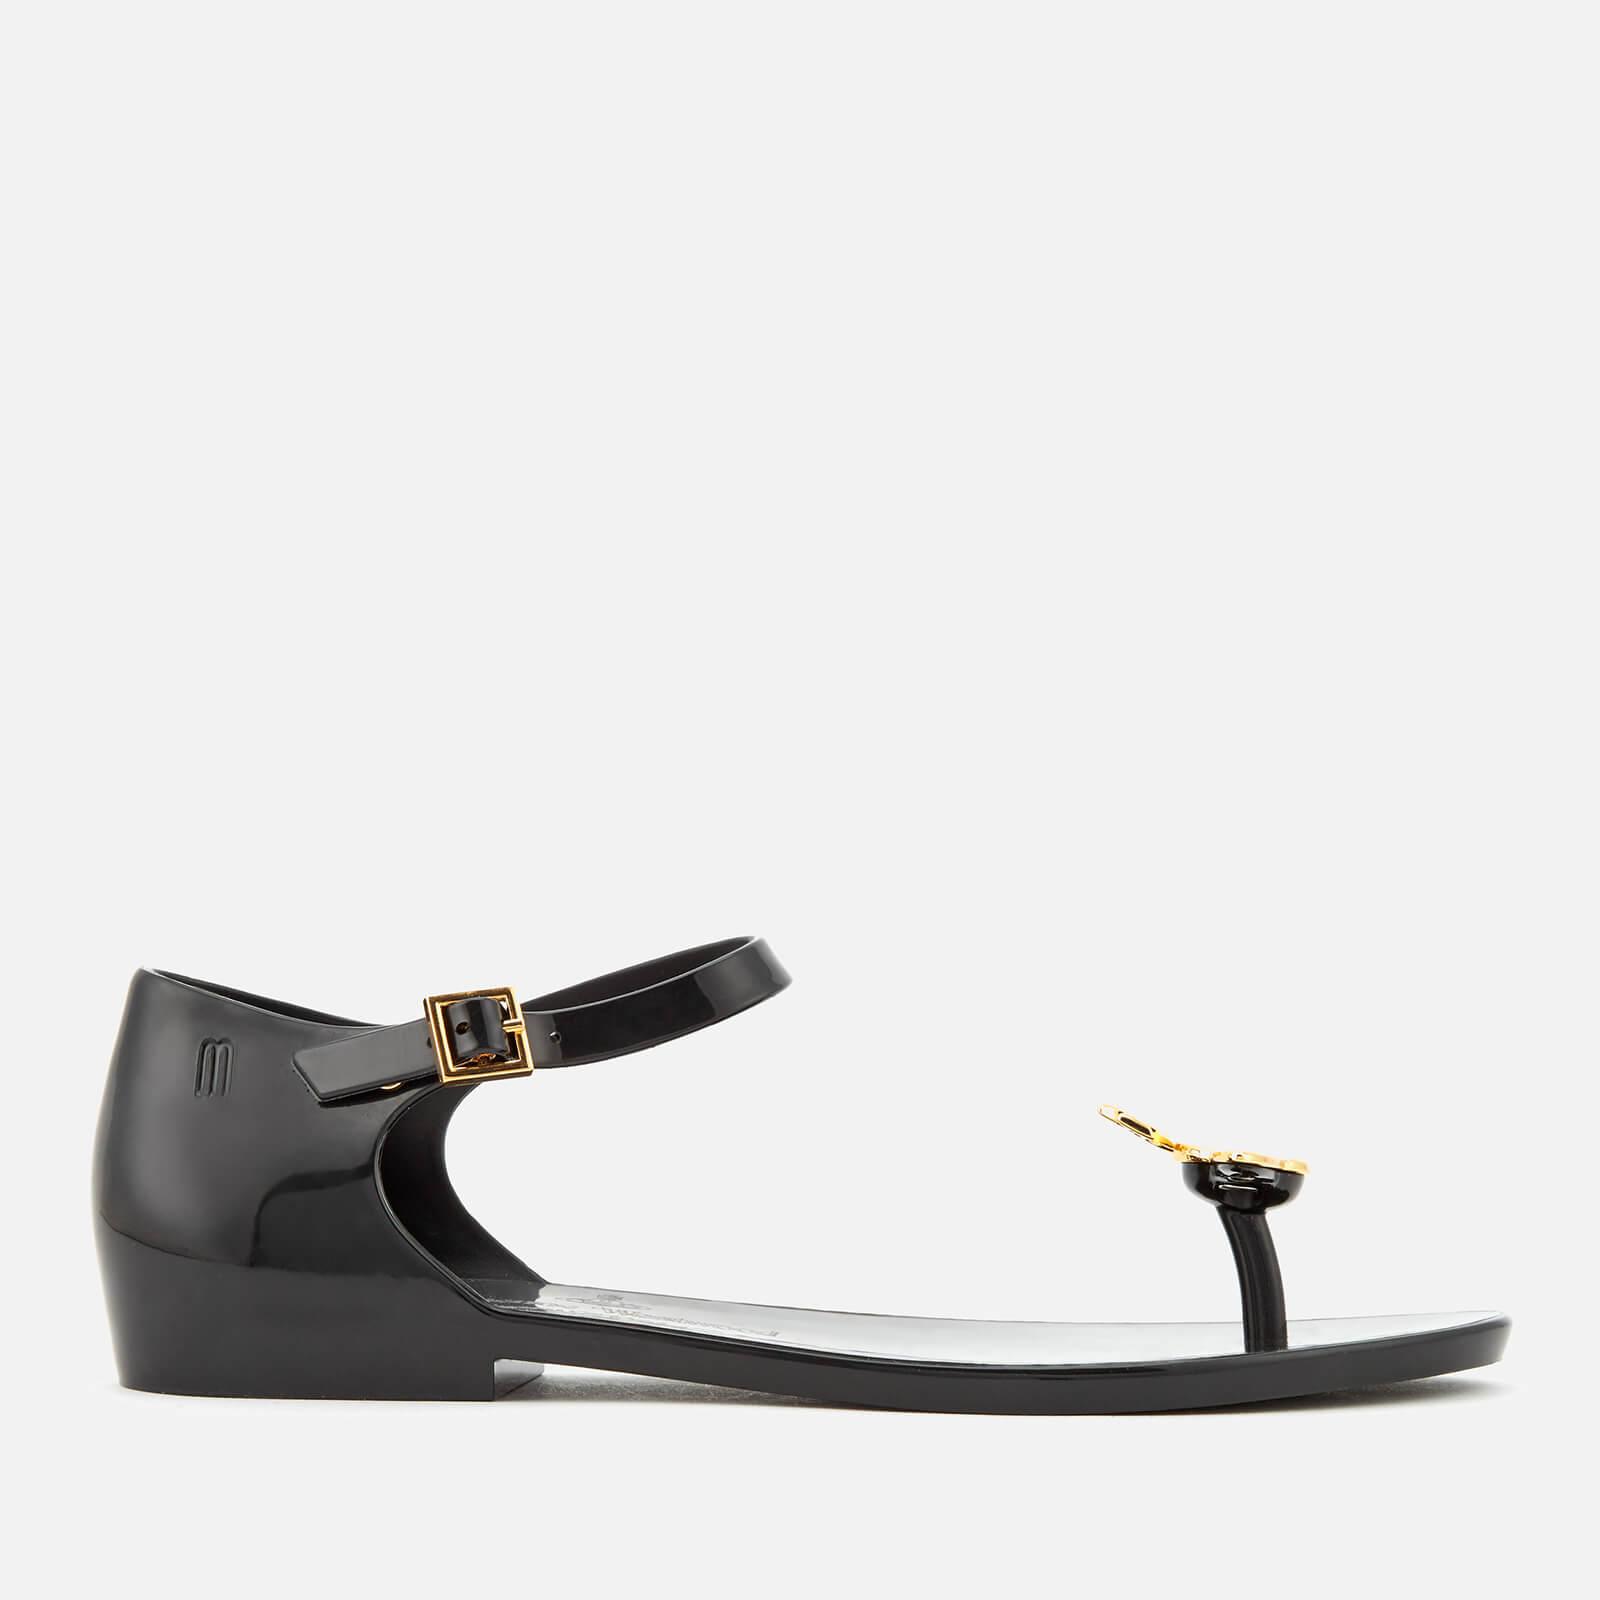 Vivienne Westwood for Melissa Women's Honey Toe Post Sandals - Black Orb - UK 7 - Black